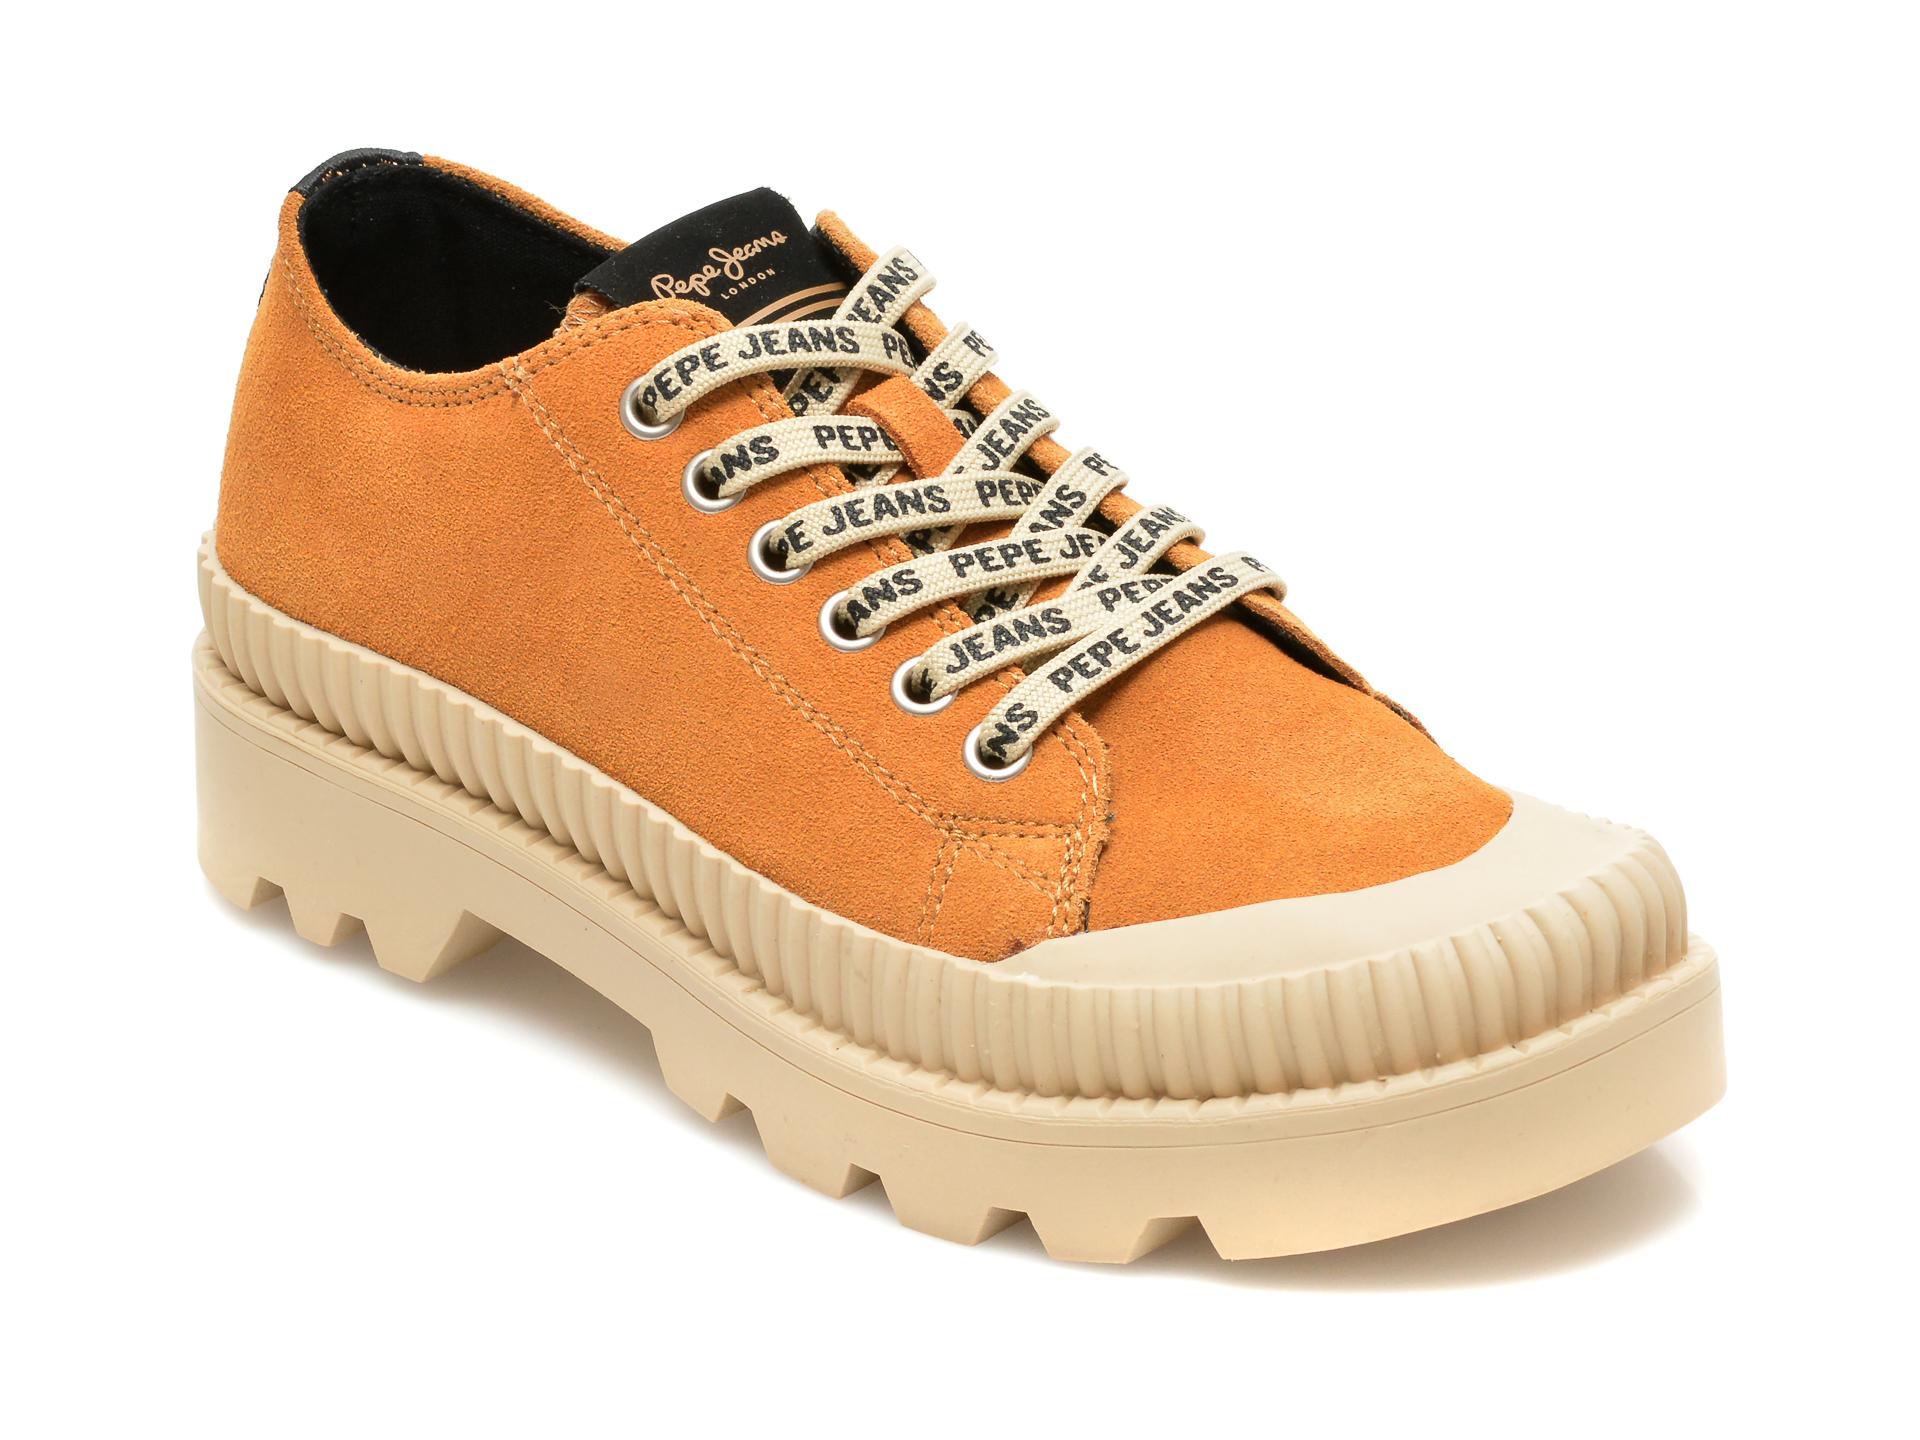 Pantofi PEPE JEANS maro, LS10401, din piele intoarsa